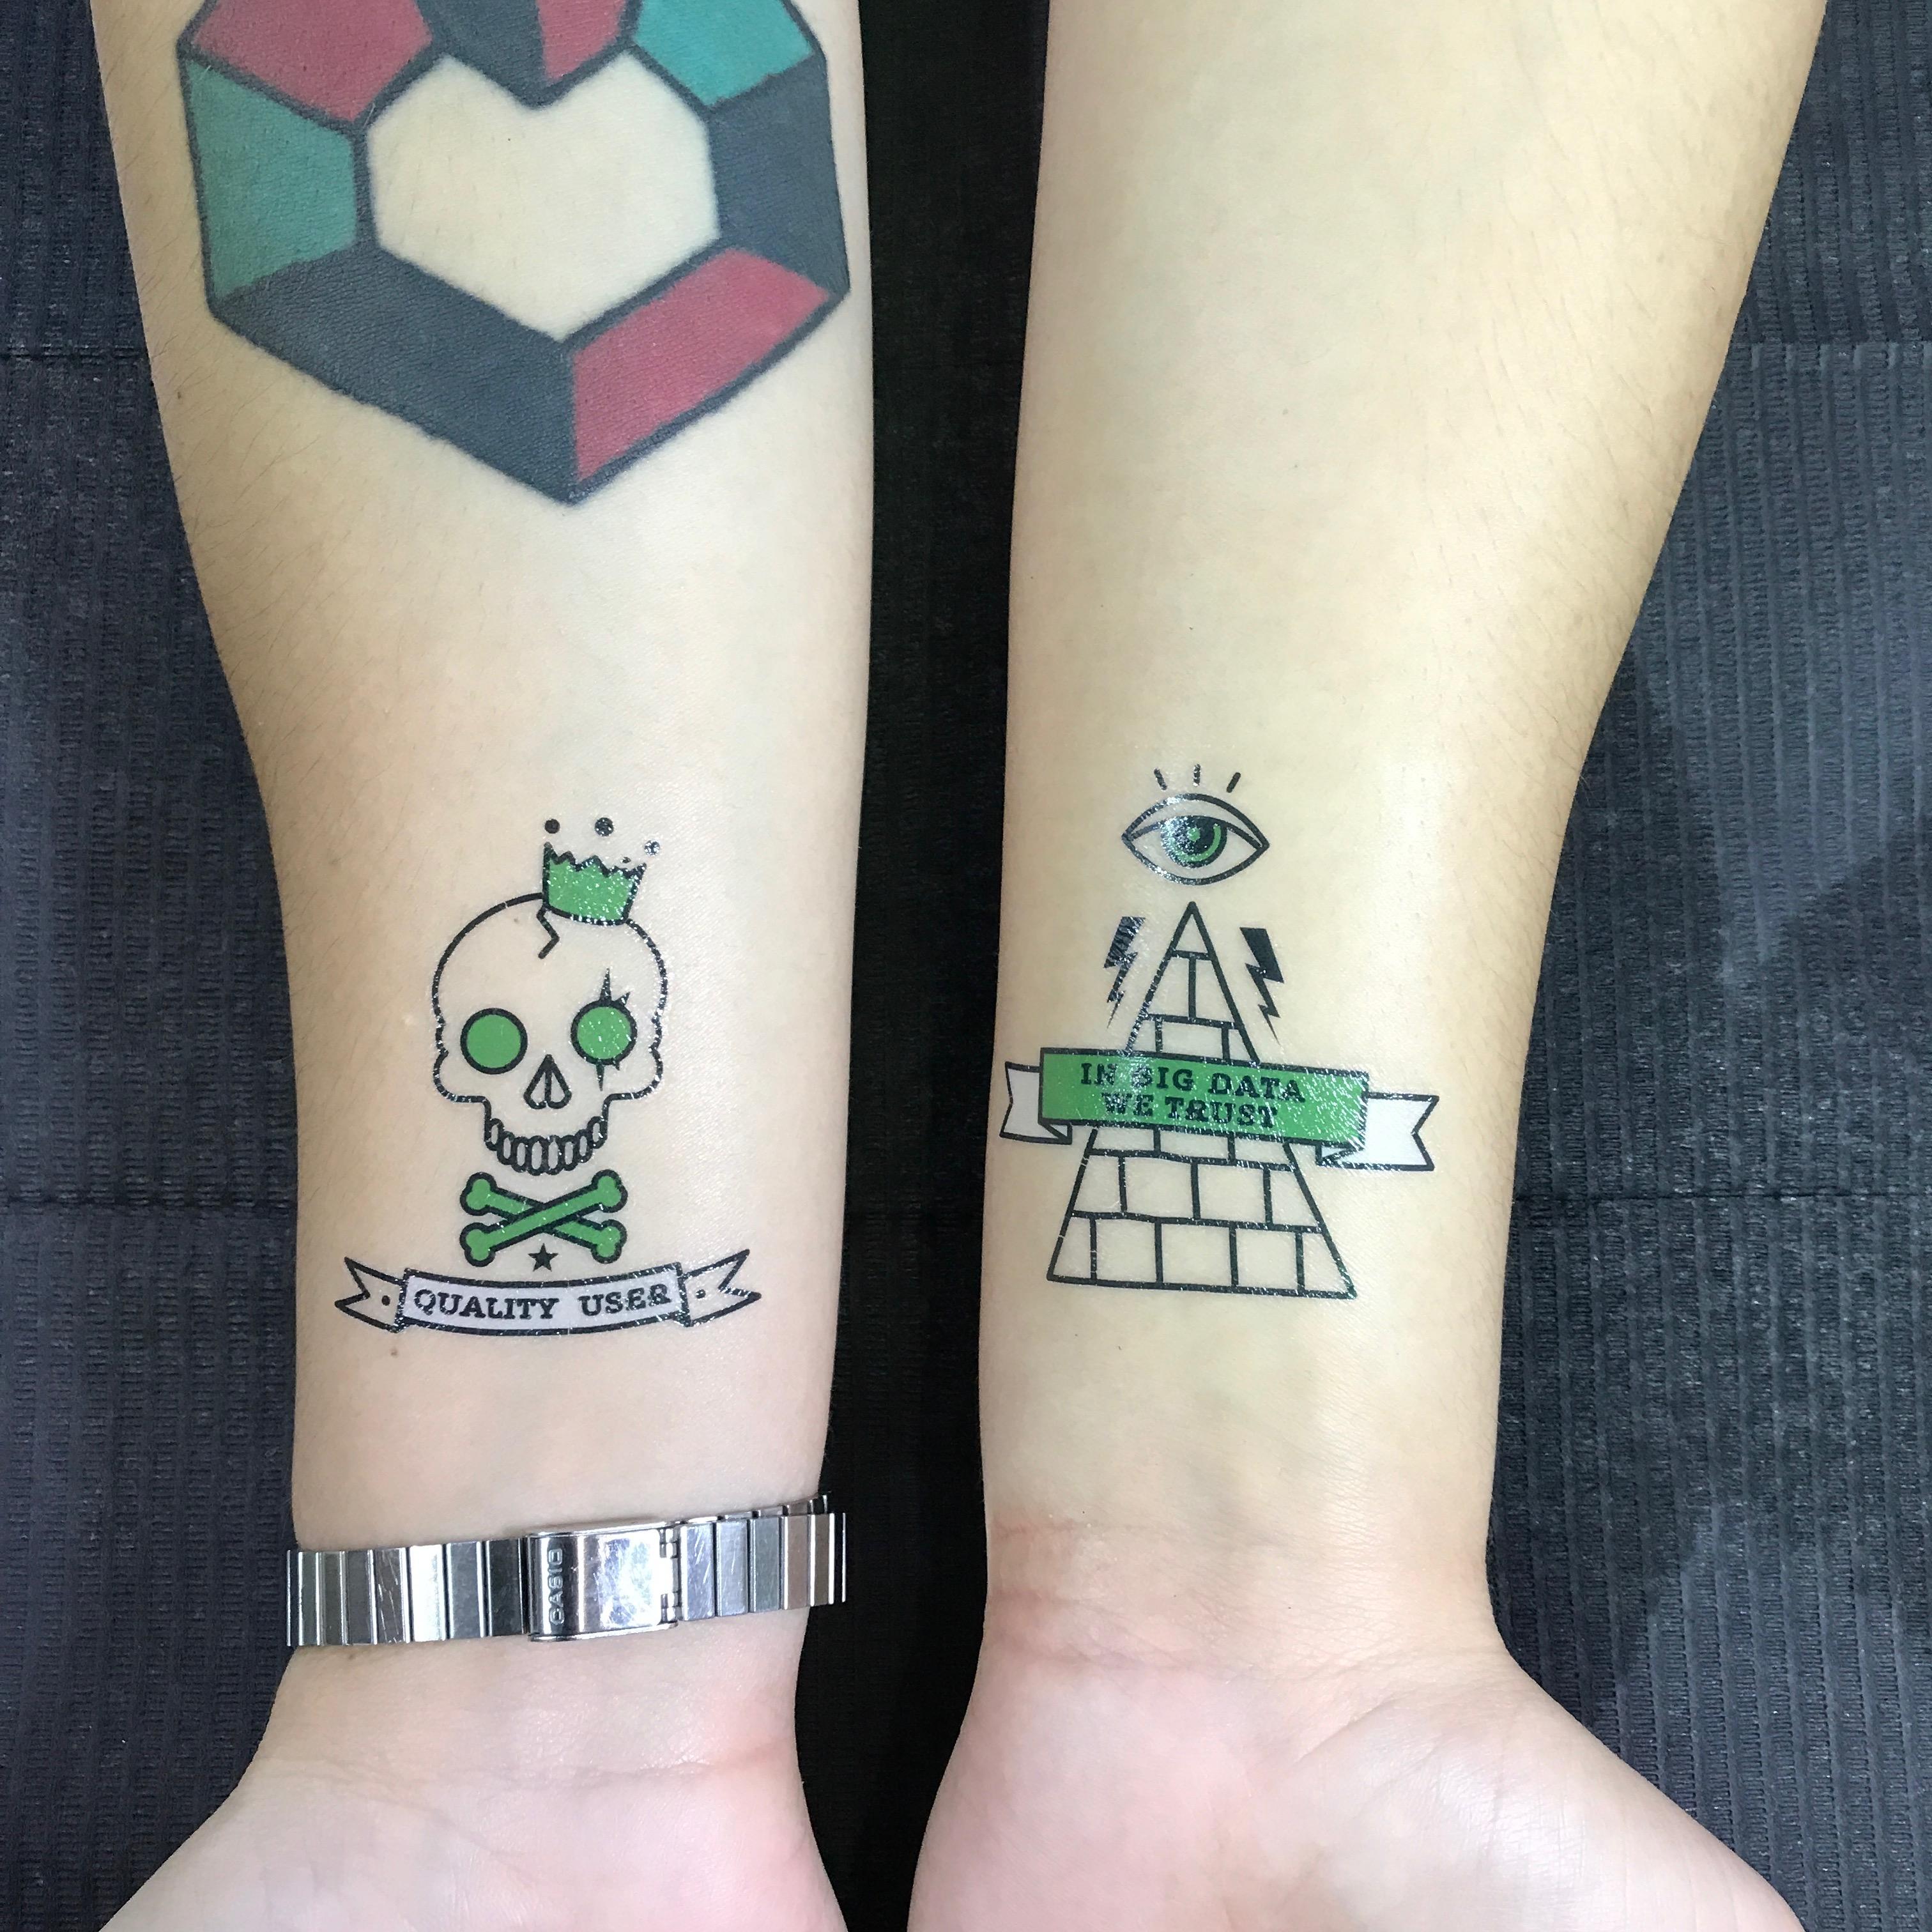 startapp at dmexco: tattoos